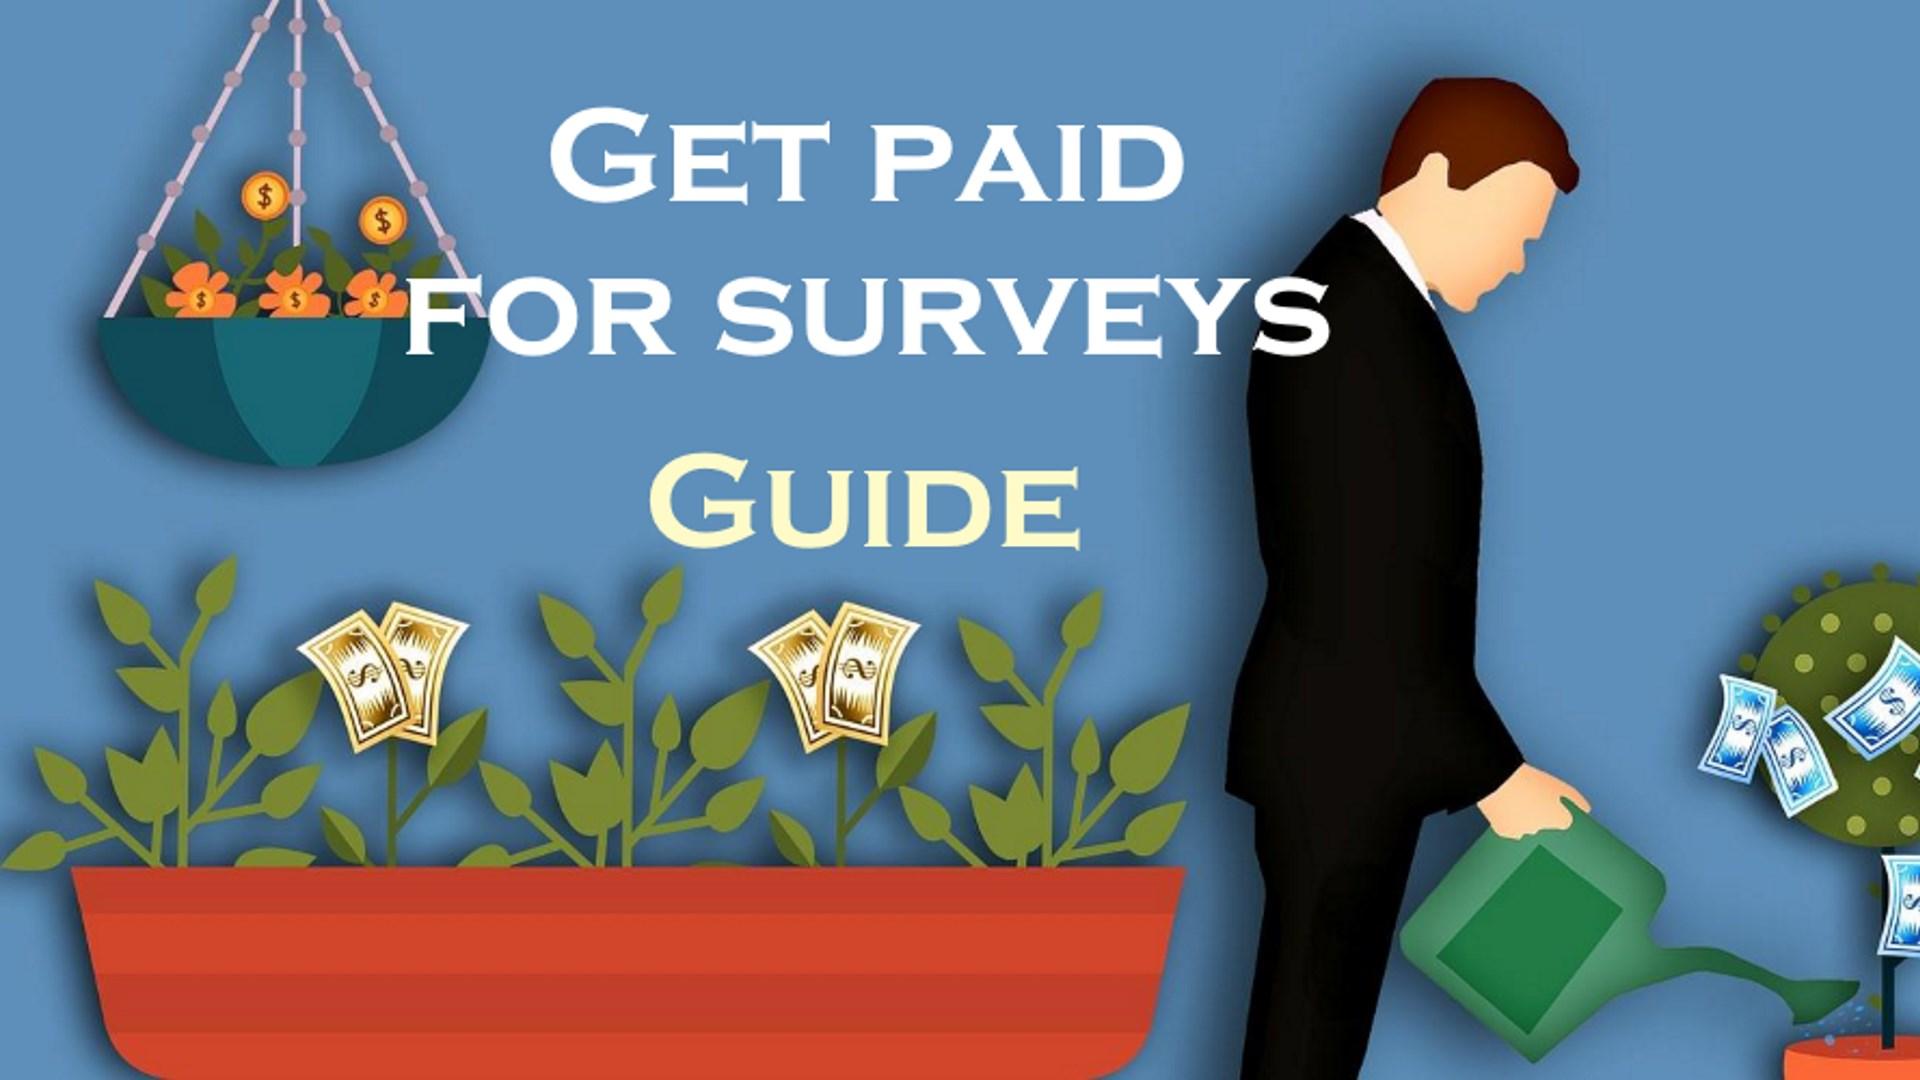 get survey for money earn money paid surveys guide microsoft store